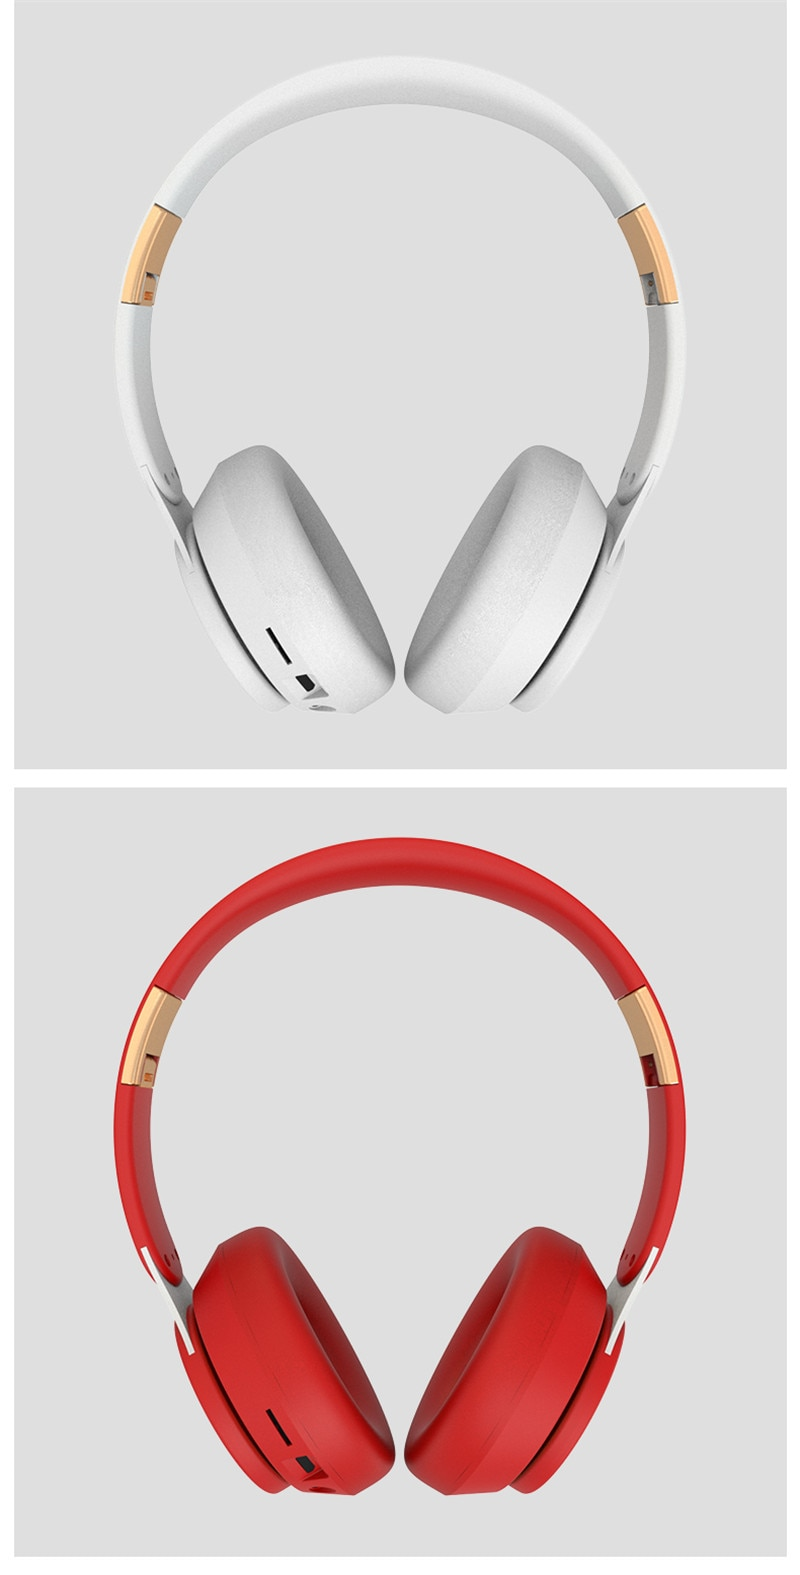 Adjustable Wireless Stereo Headphones